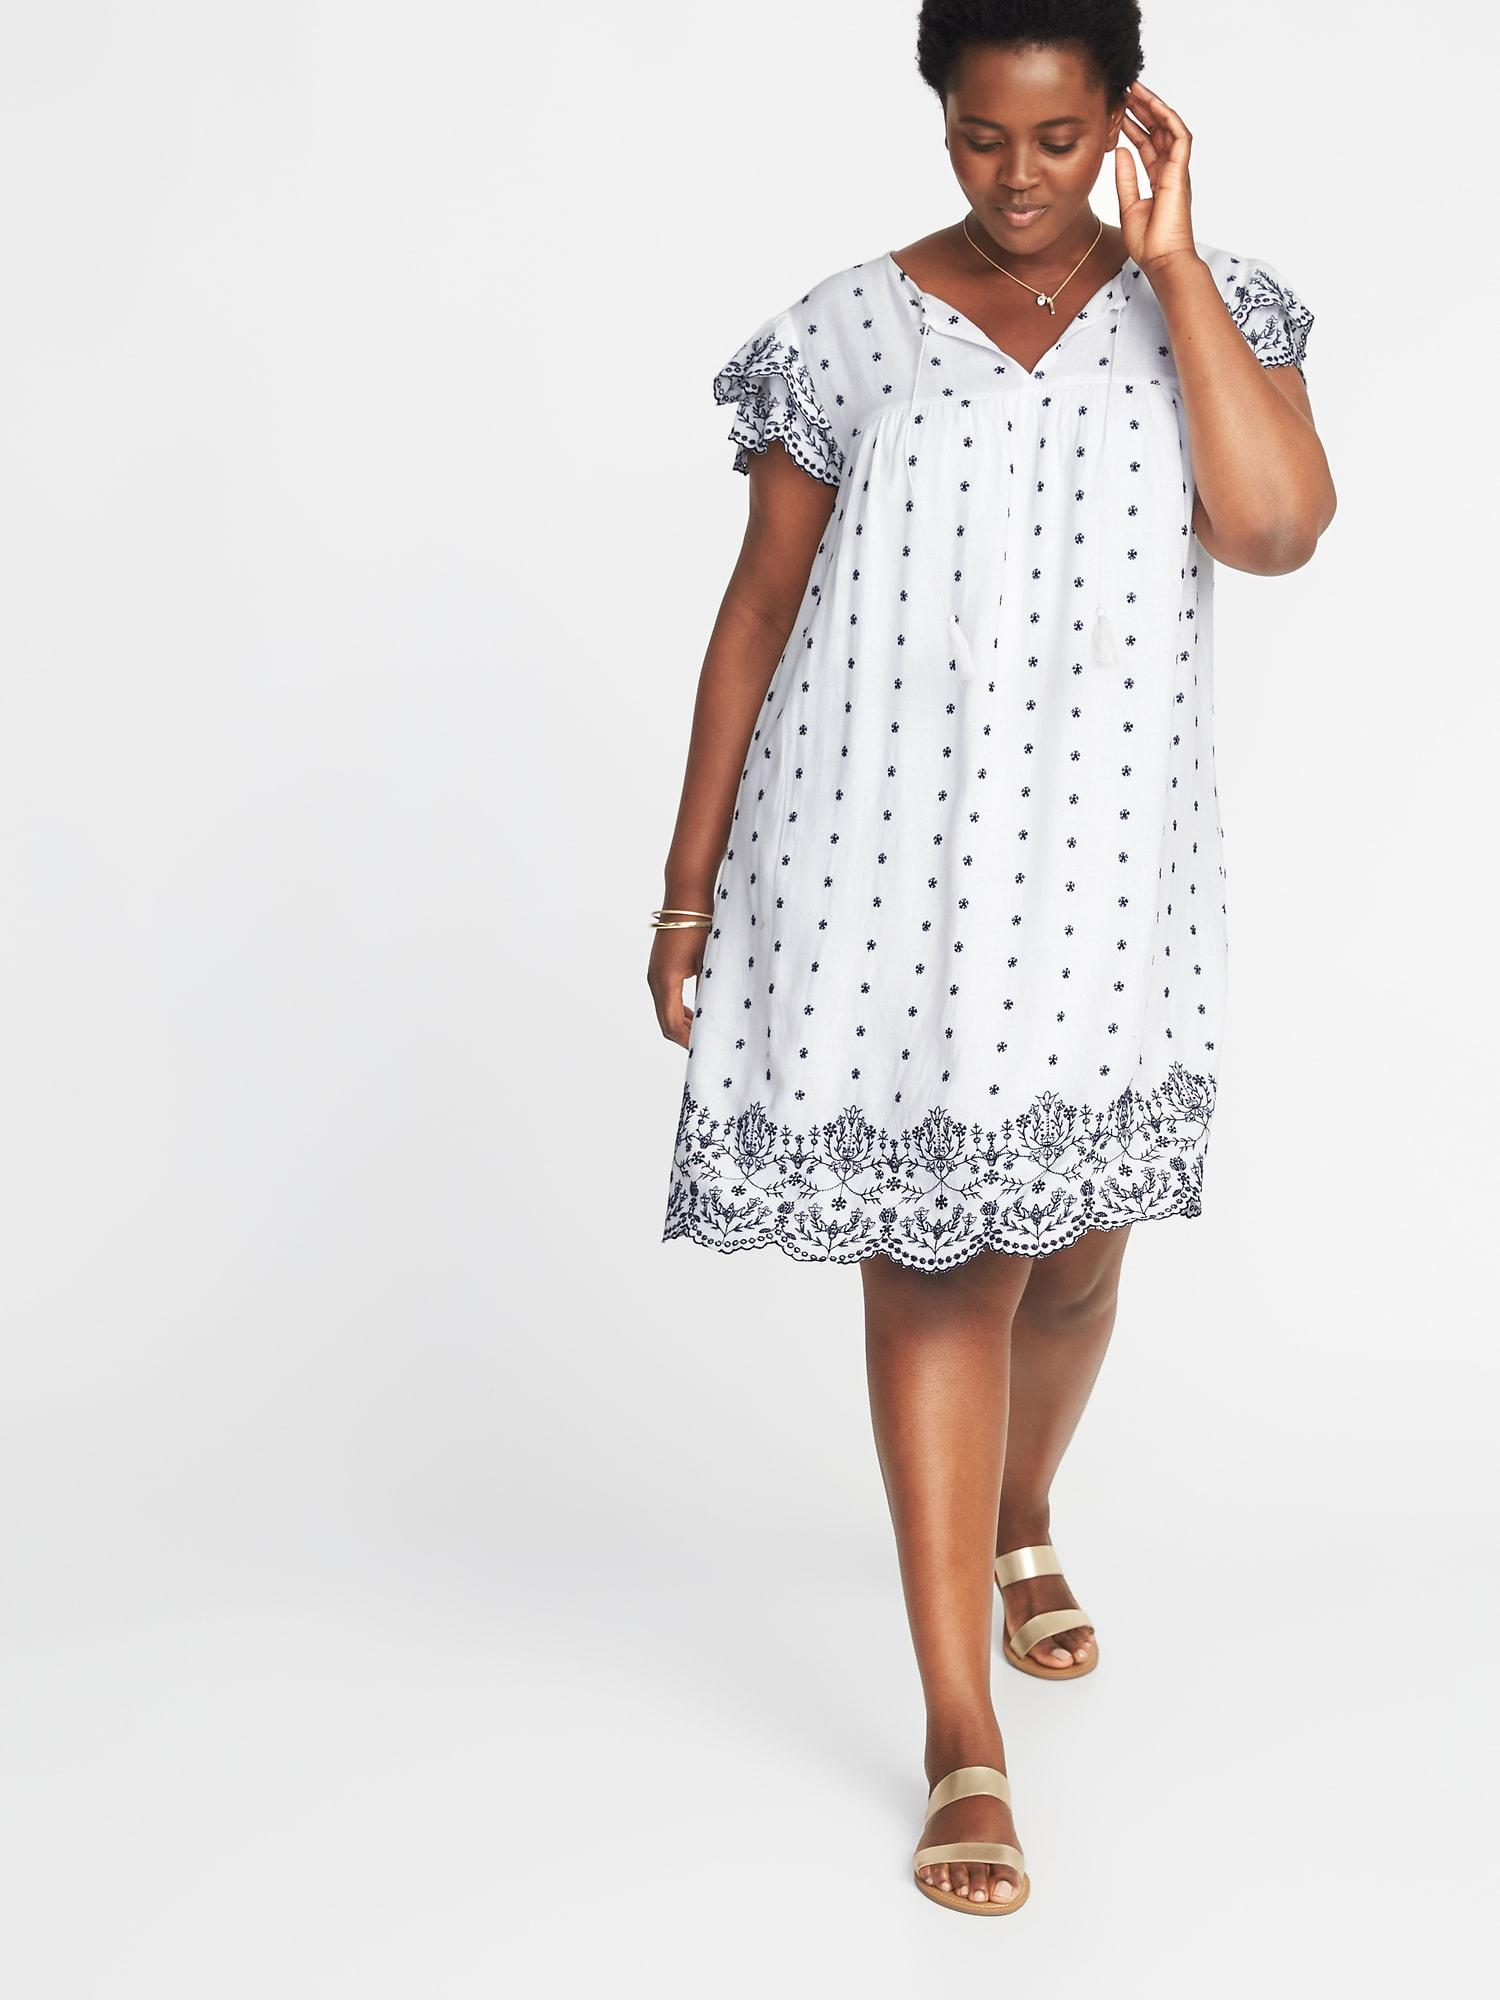 795178a6b92 Lyst - Old Navy Plus-size Linen-blend Cutwork Swing Dress in White